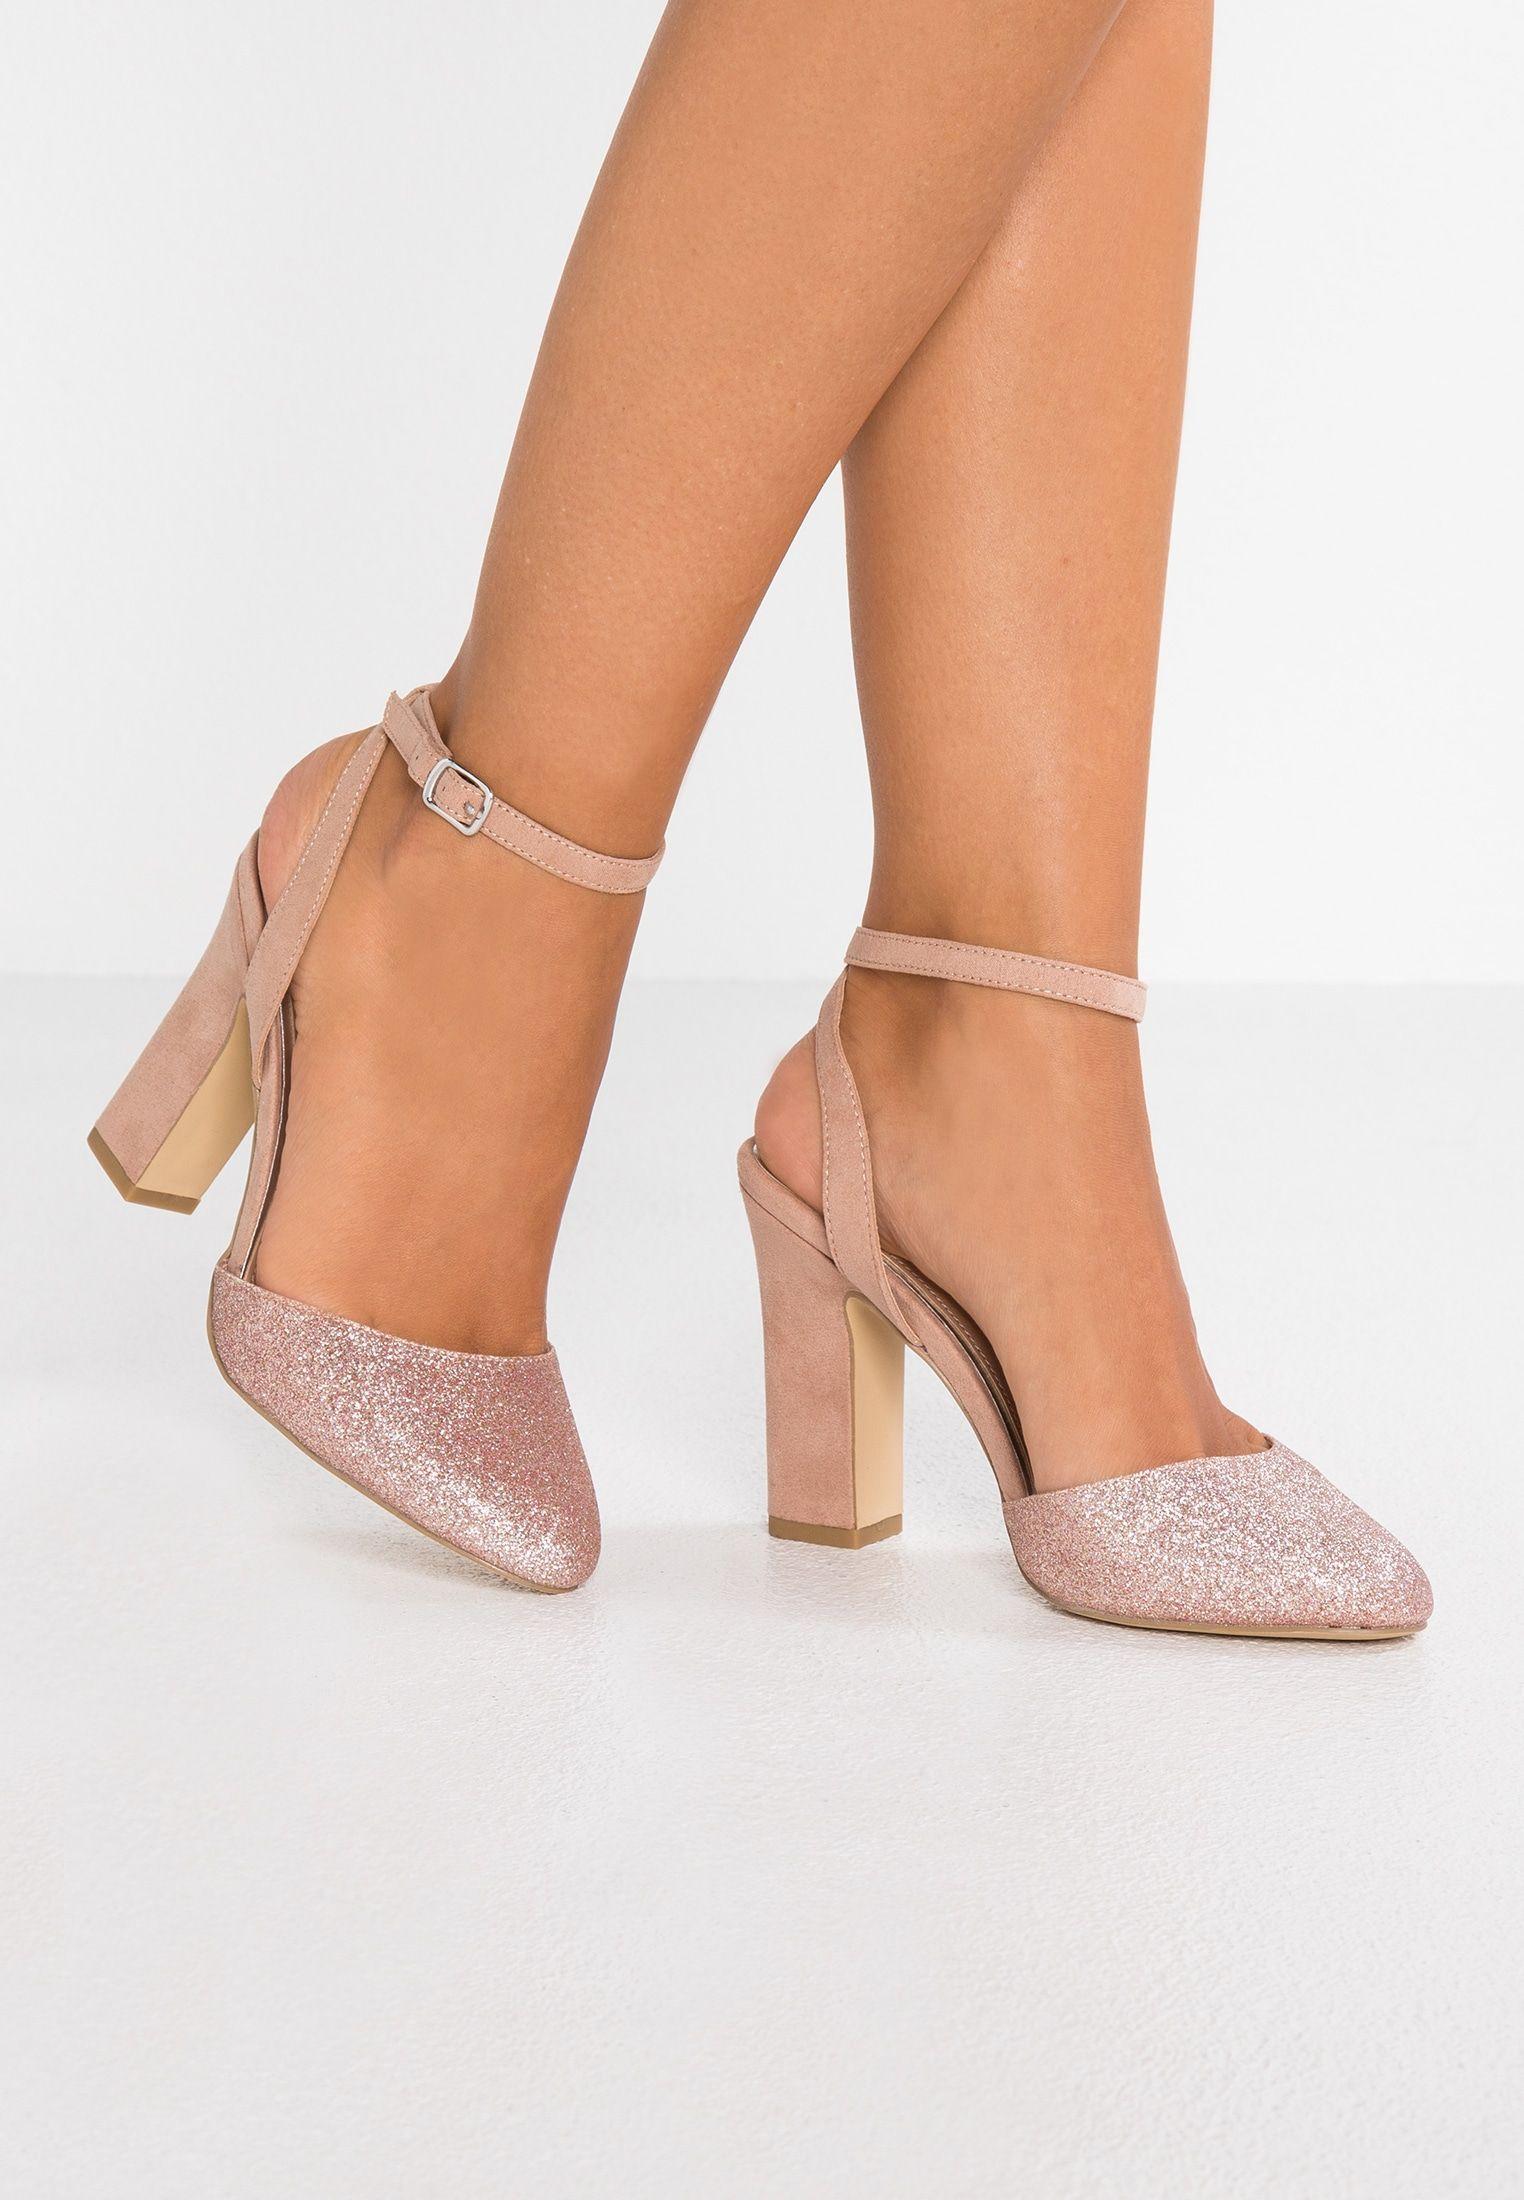 Asos Design Wide Fit Vapor Snaffle Loafer In Beige Asos Luggage Gearluggage Bagstravel Geartravel Bagsbriefcasestotesu Beige Shoes Loafer Shoes Women Loafers